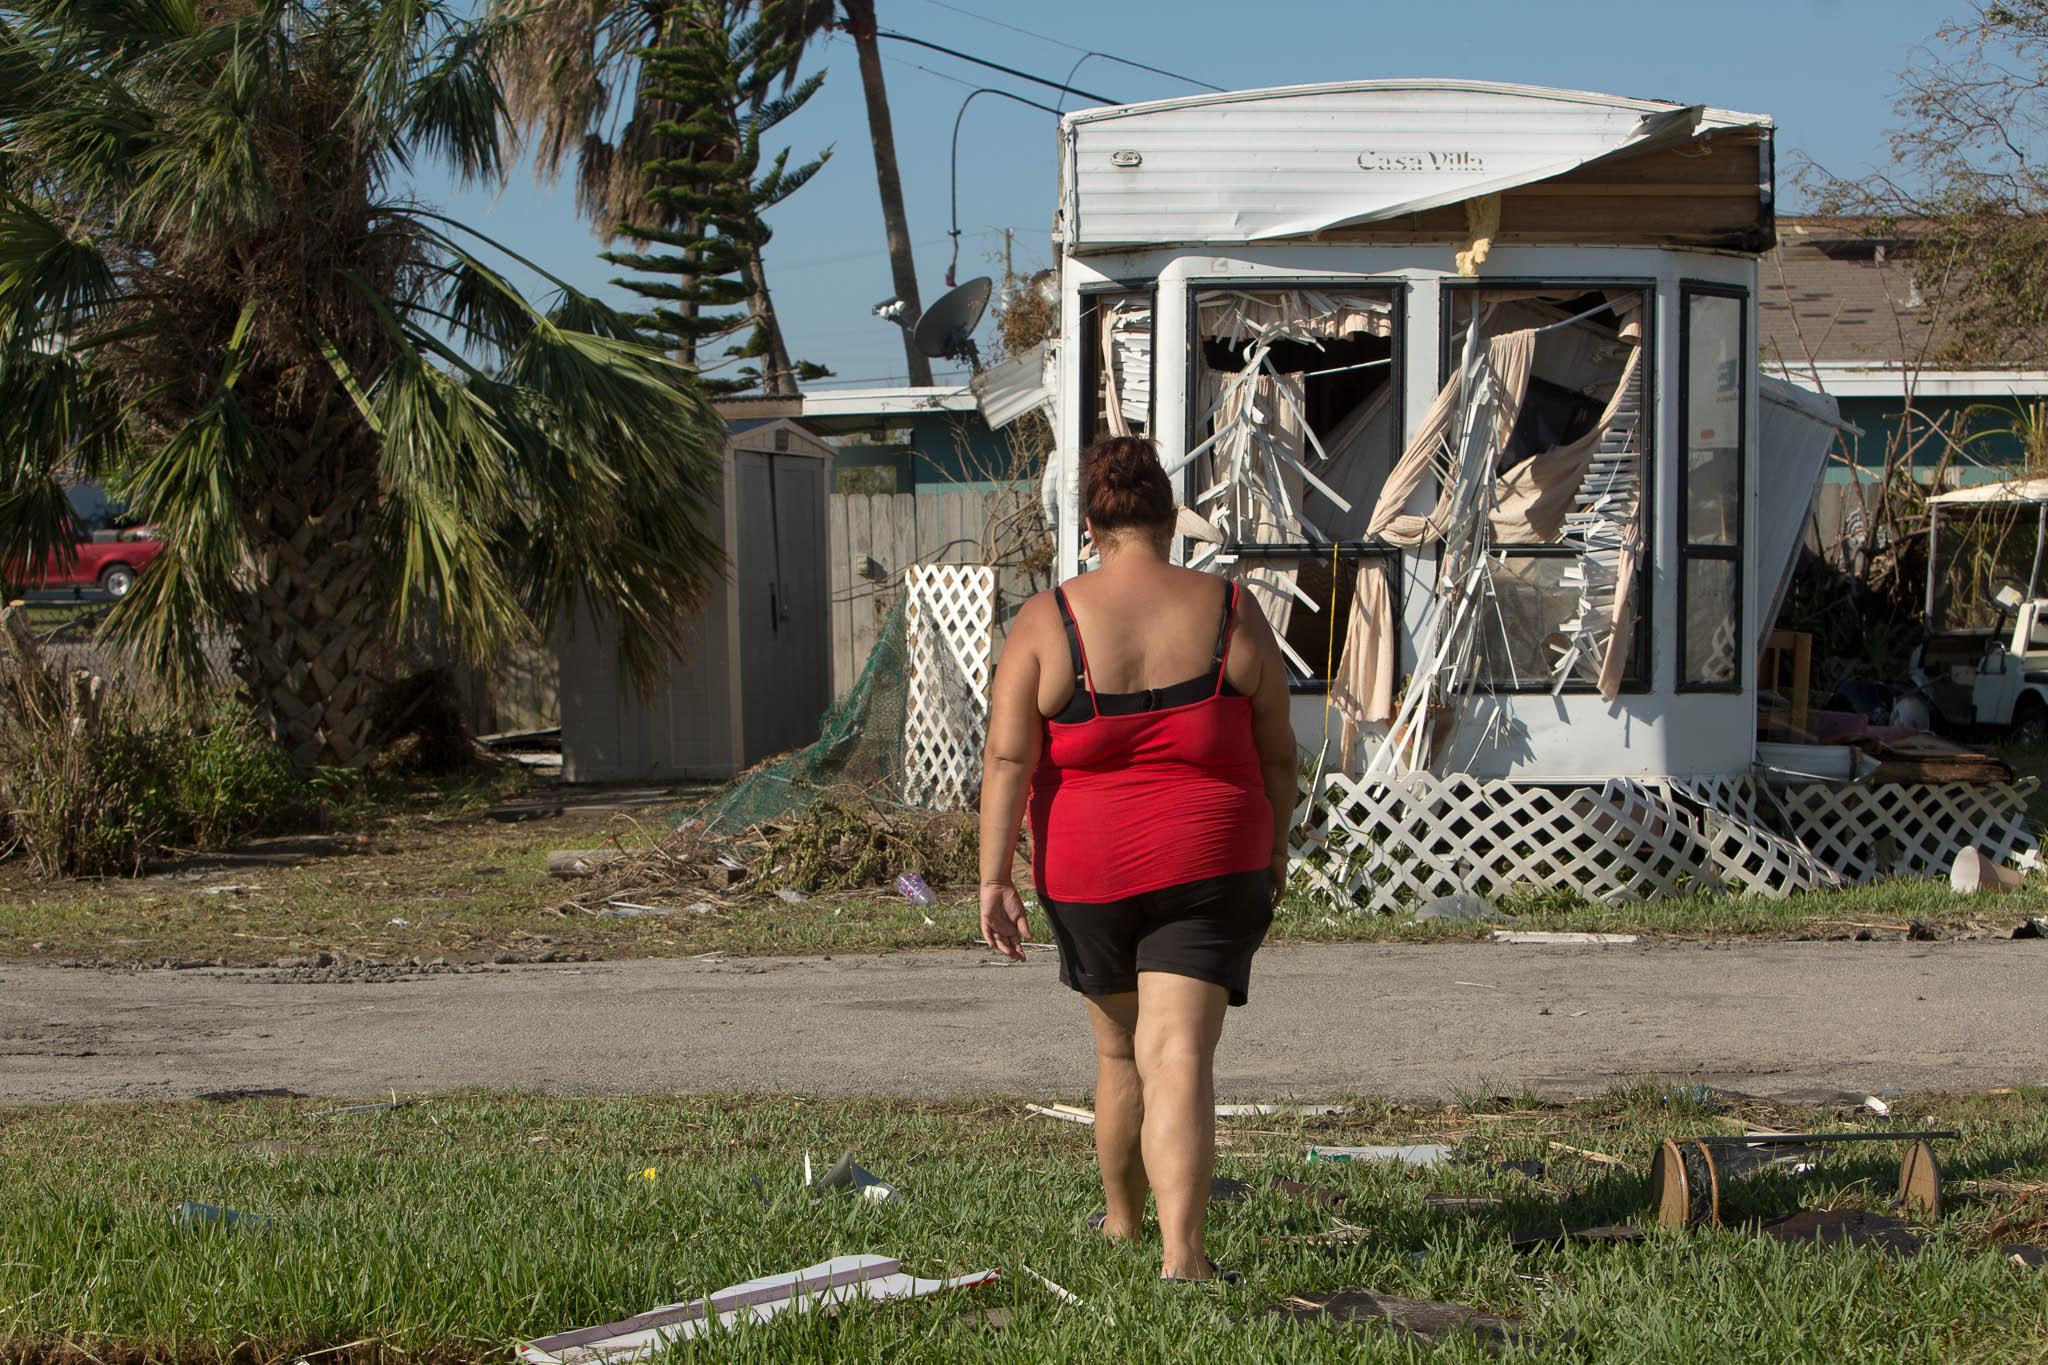 Jessica Williford walks towards a damaged mobile home at Beacon Trailer Park in Port Aransas, Texas.